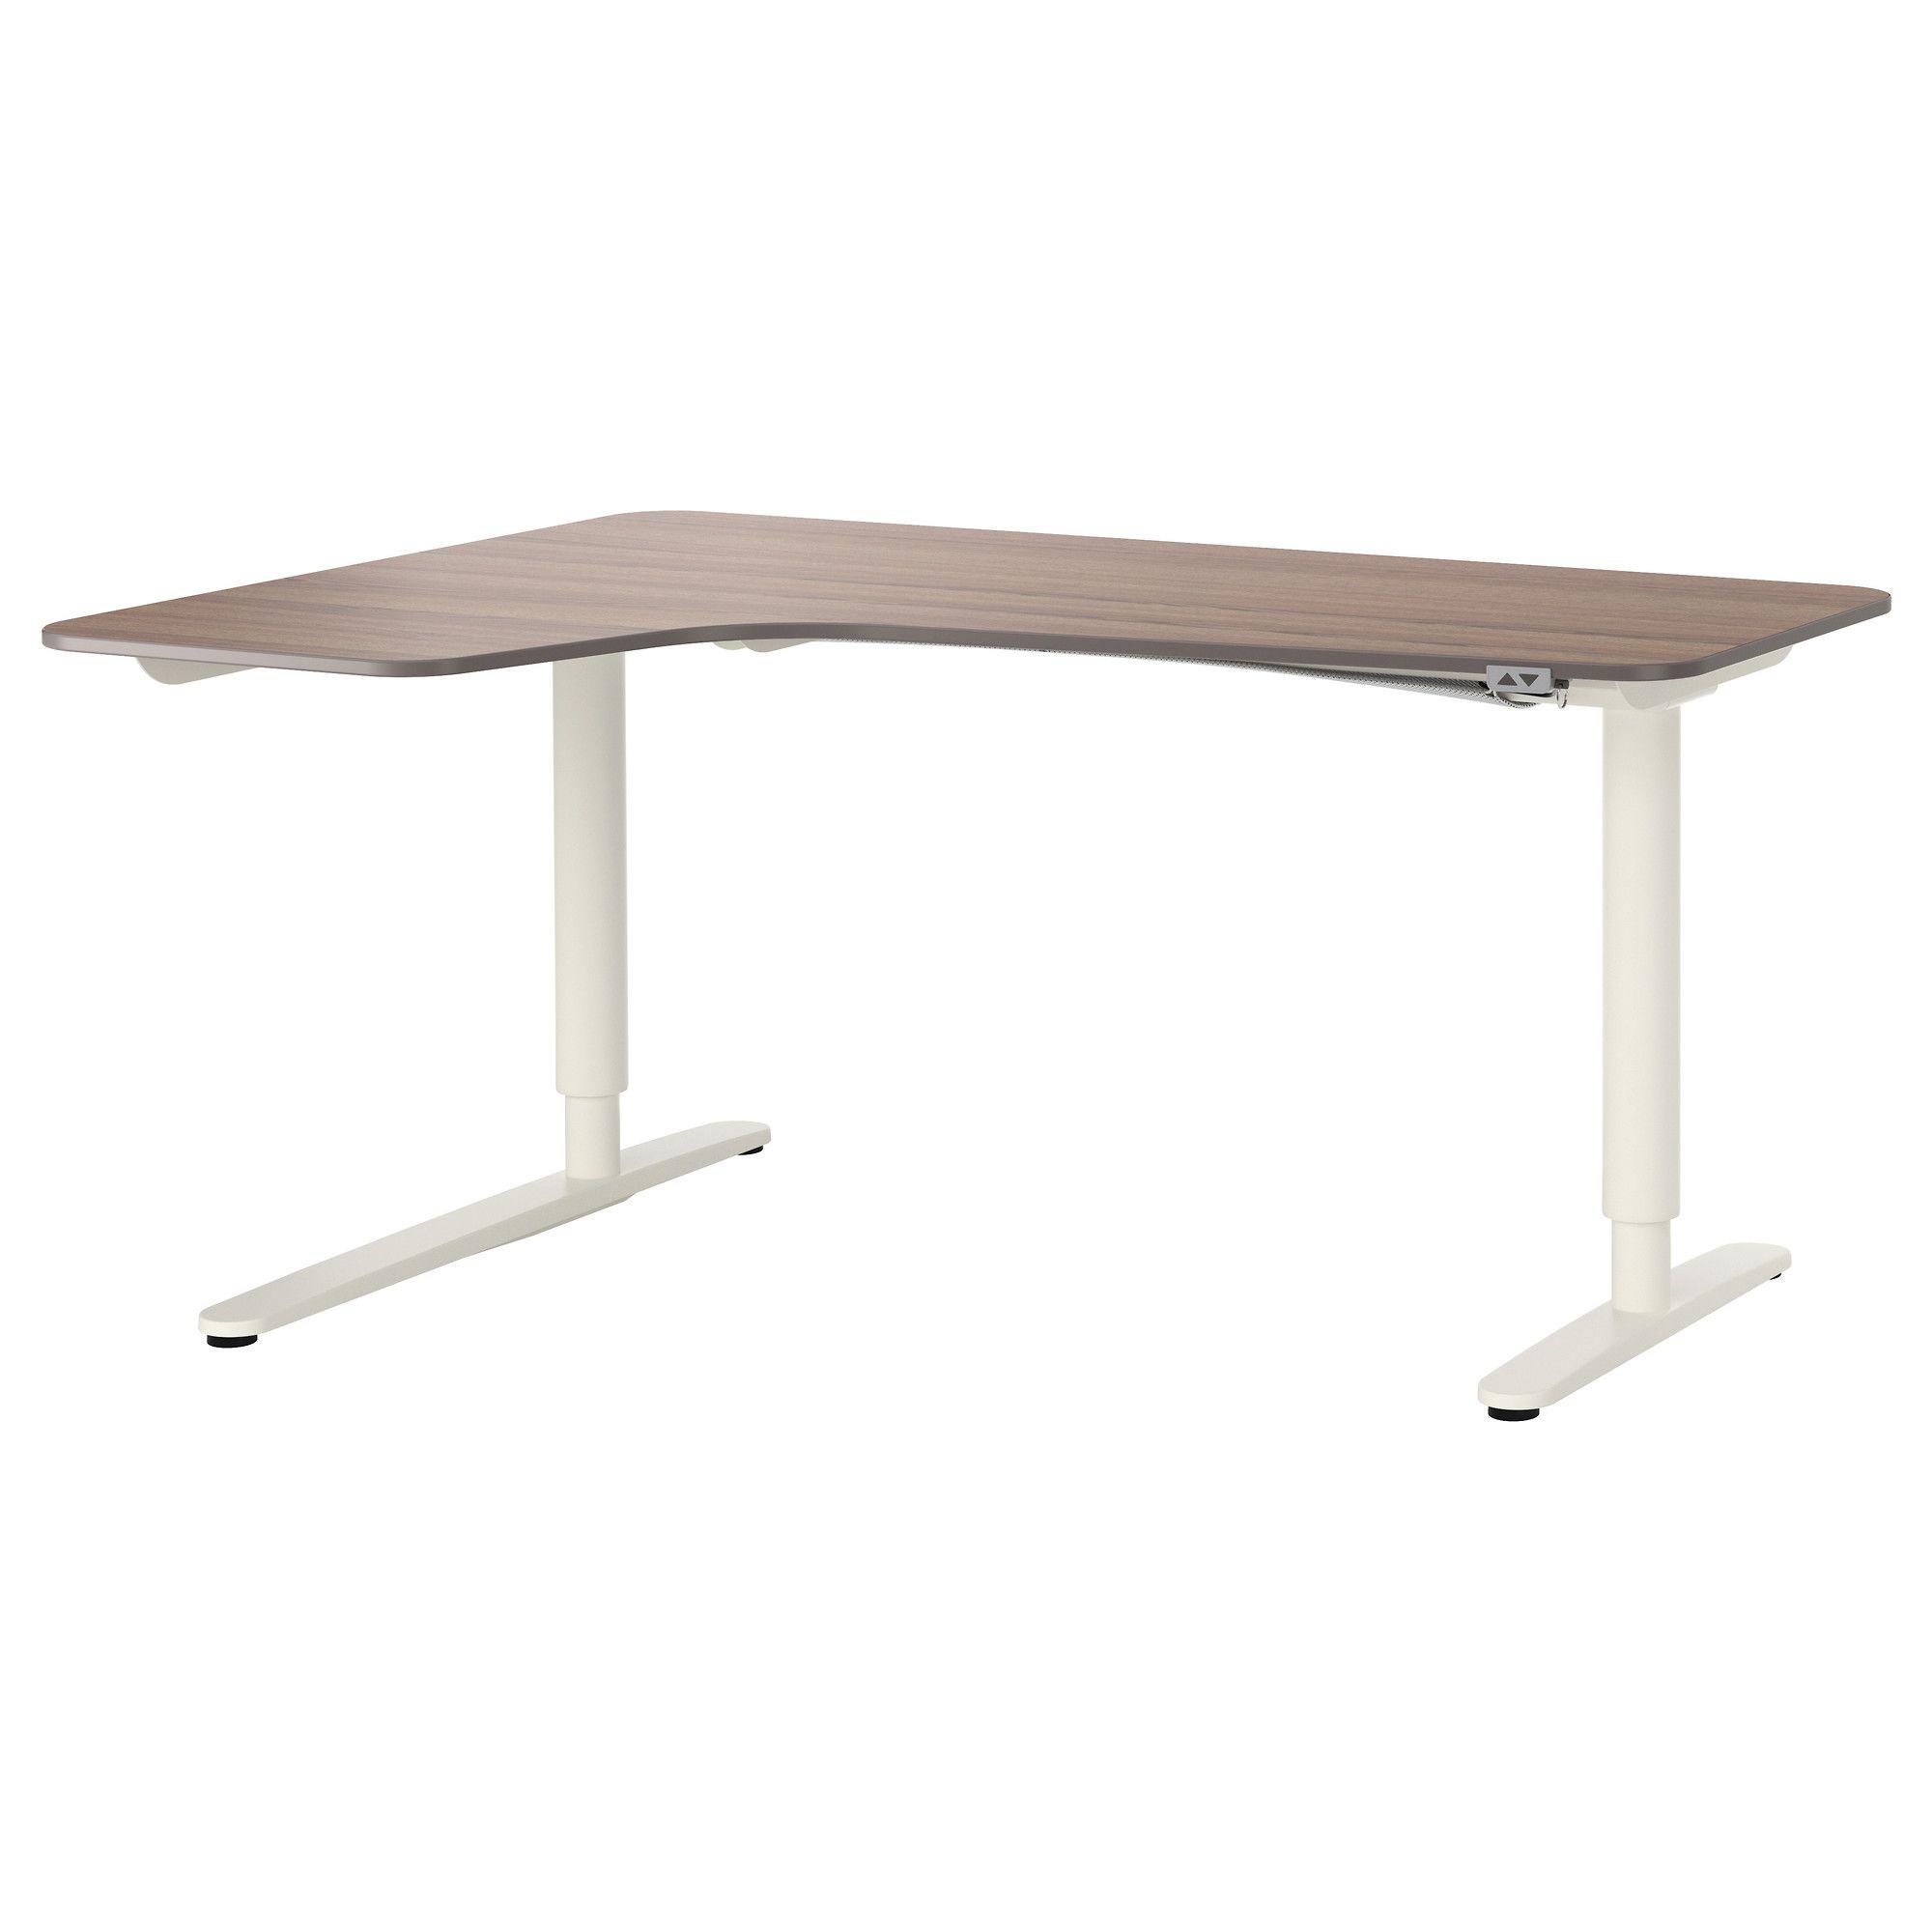 Ikea Bekant Corner Desk Left Sit Stand Gray White